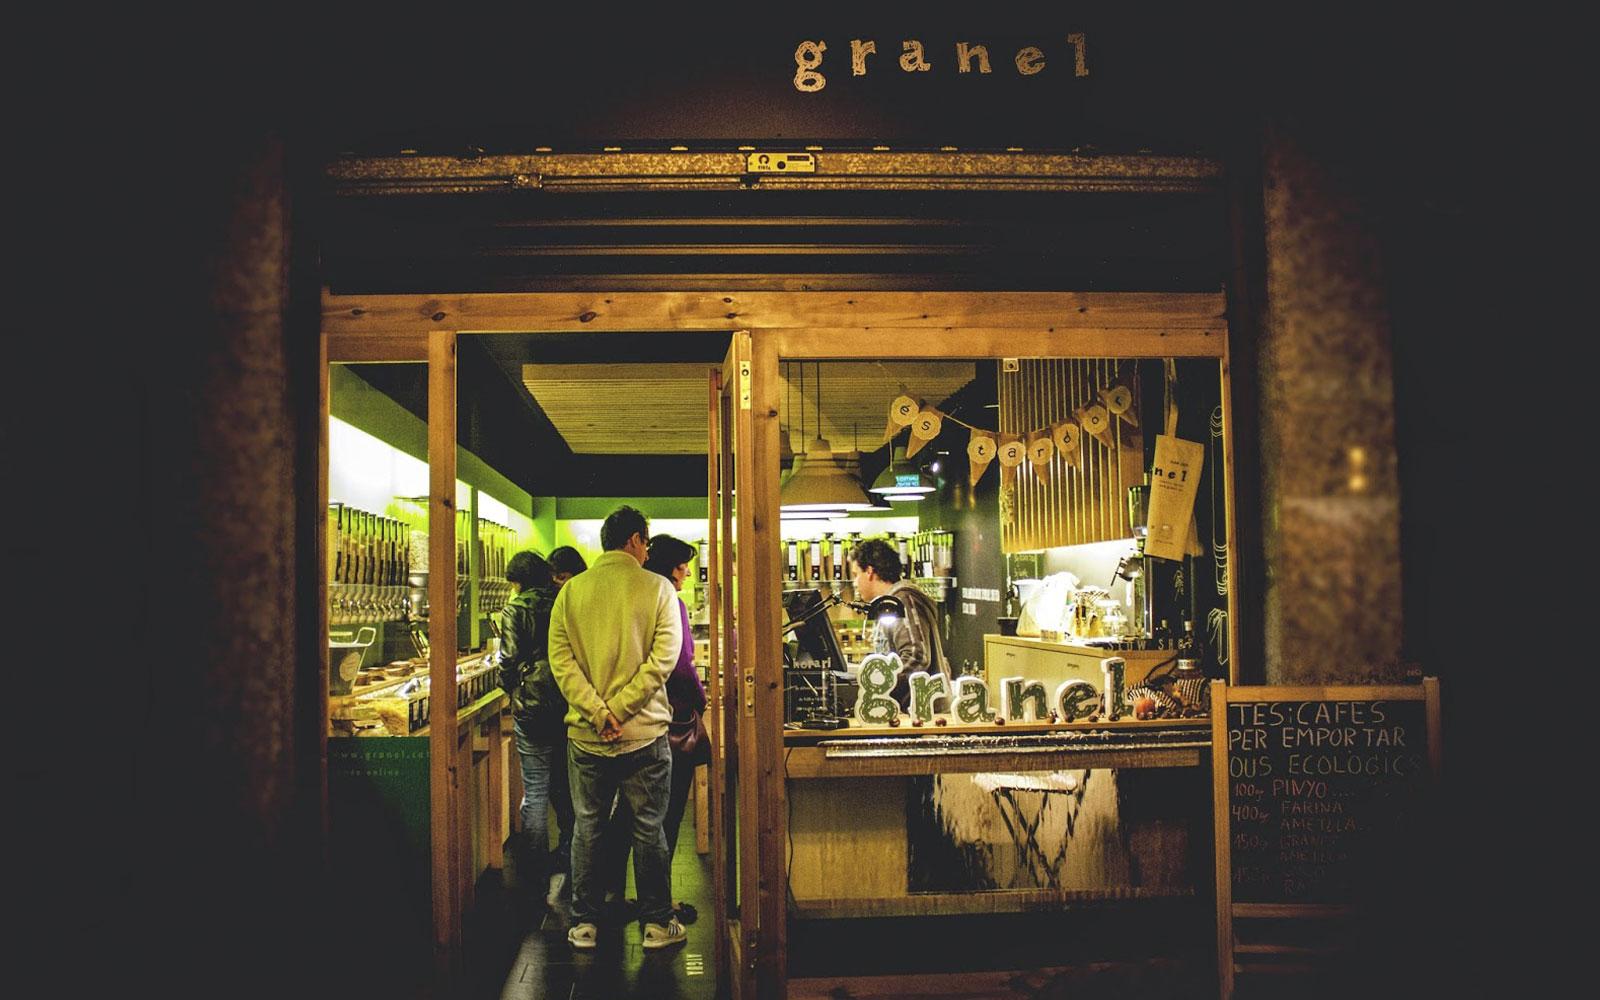 granel 4